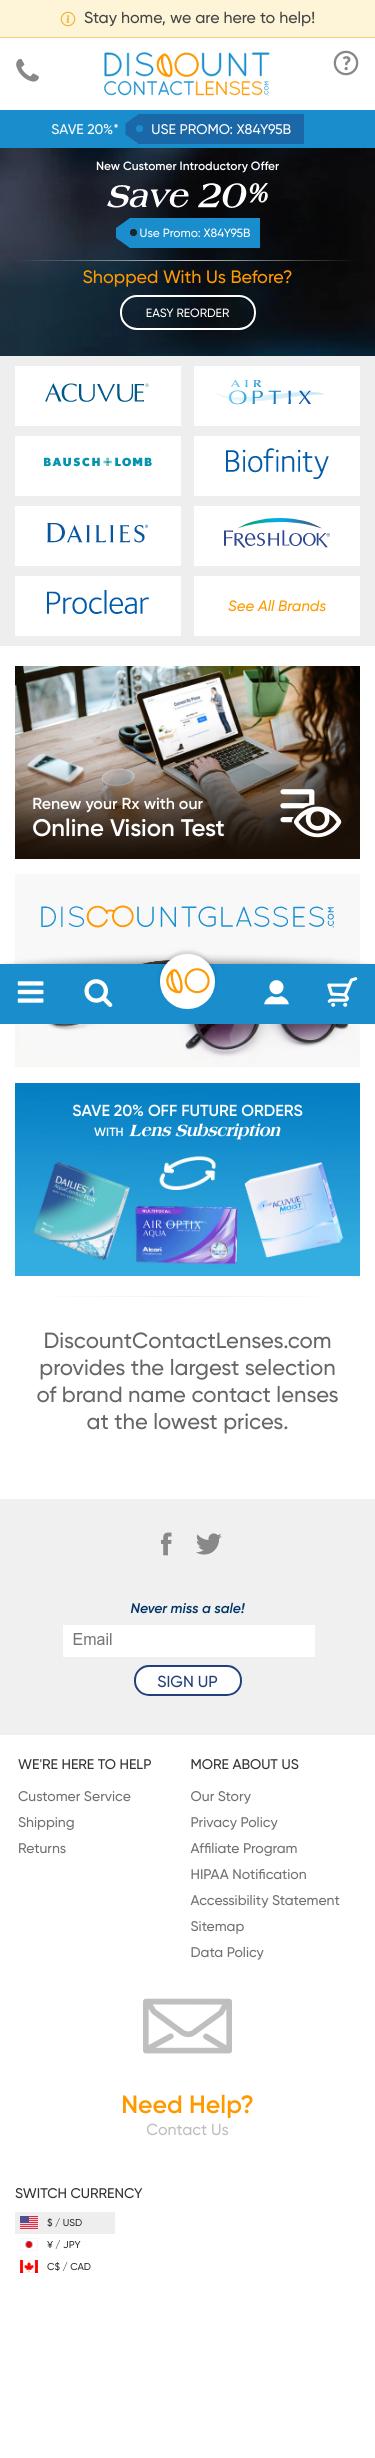 DiscountContactLenses.com Coupon